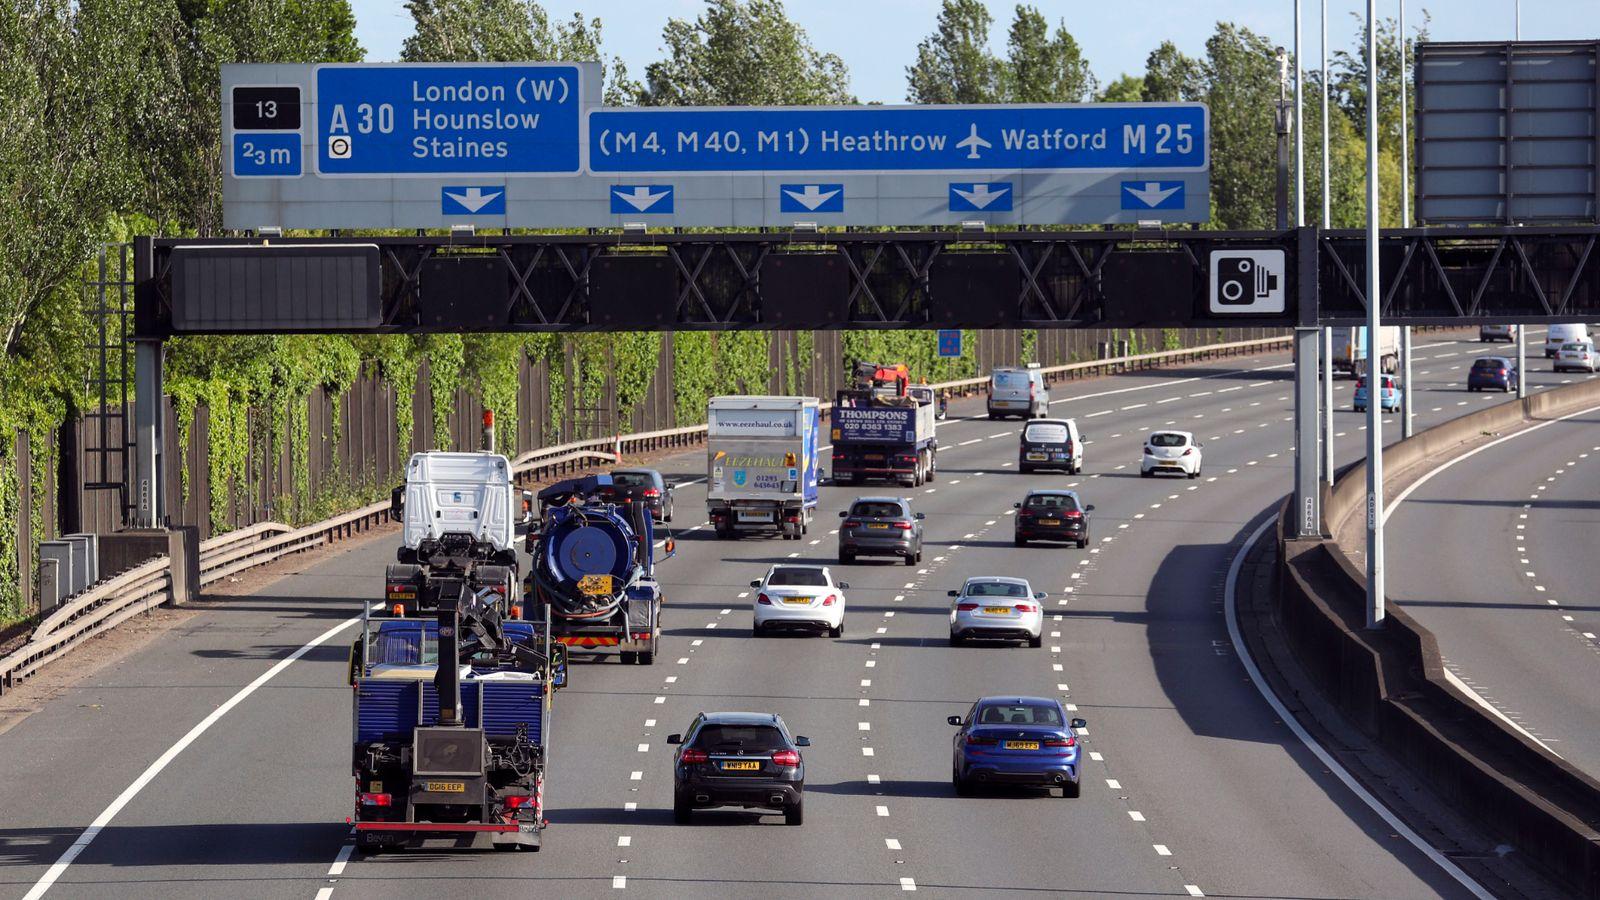 Coronavirus: Sadiq Khan quizzes Boris Johnson over plans to 'quarantine London inside M25'